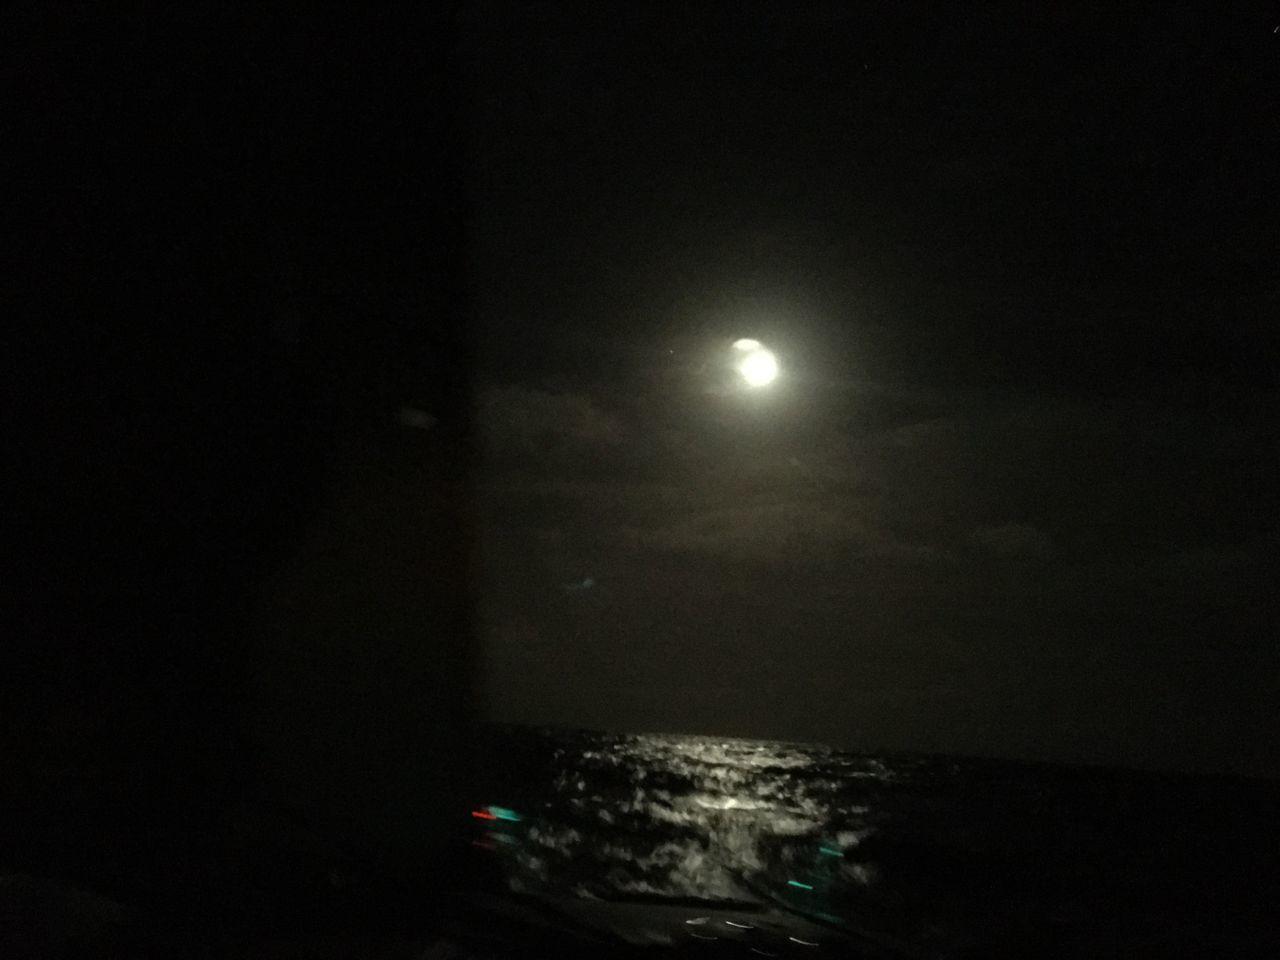 VIEW OF SEA AGAINST MOON IN SKY